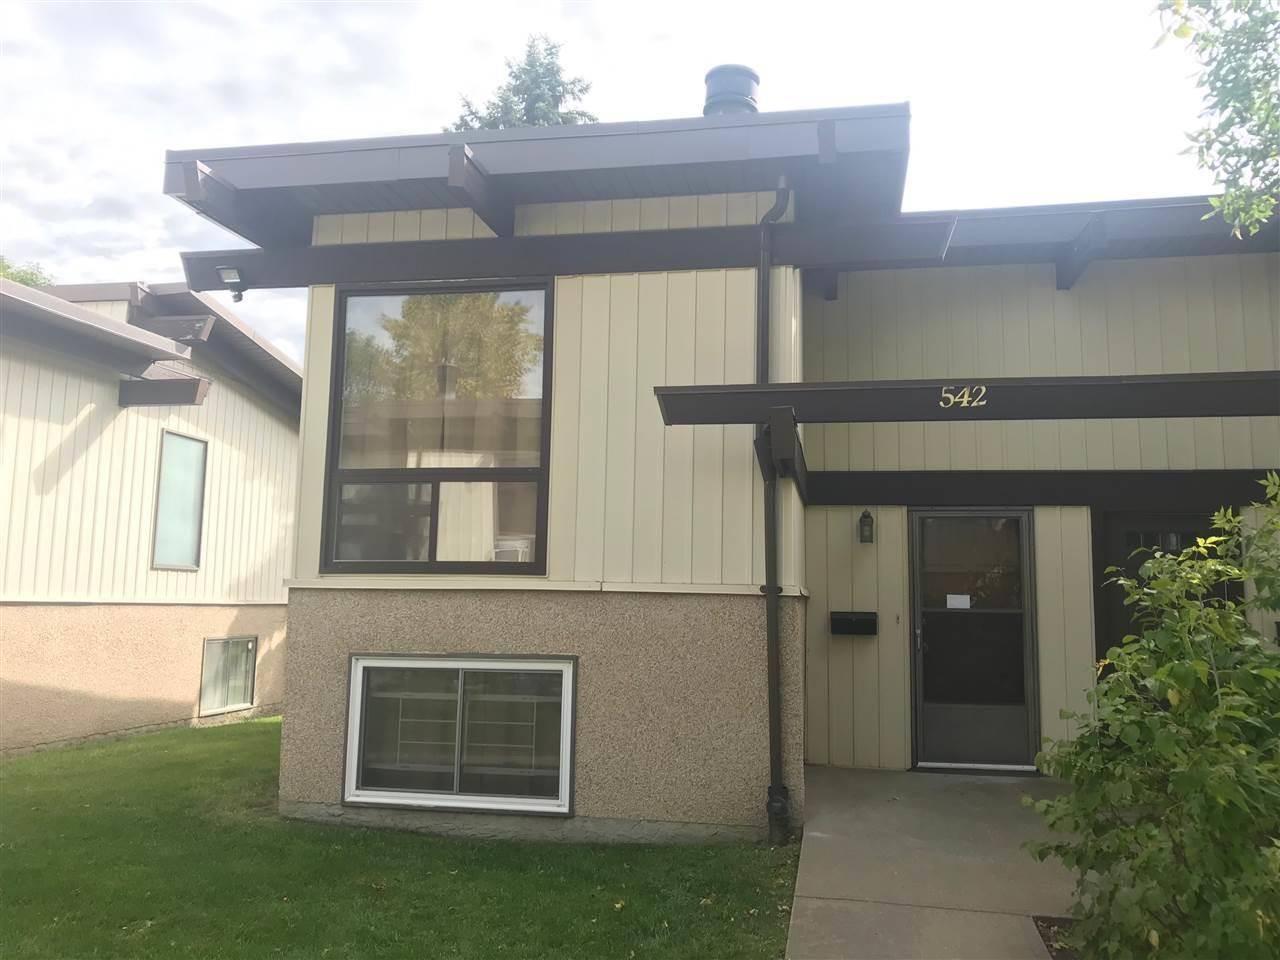 Townhouse for sale at 542 Lee_ridge Rd Nw Edmonton Alberta - MLS: E4194978